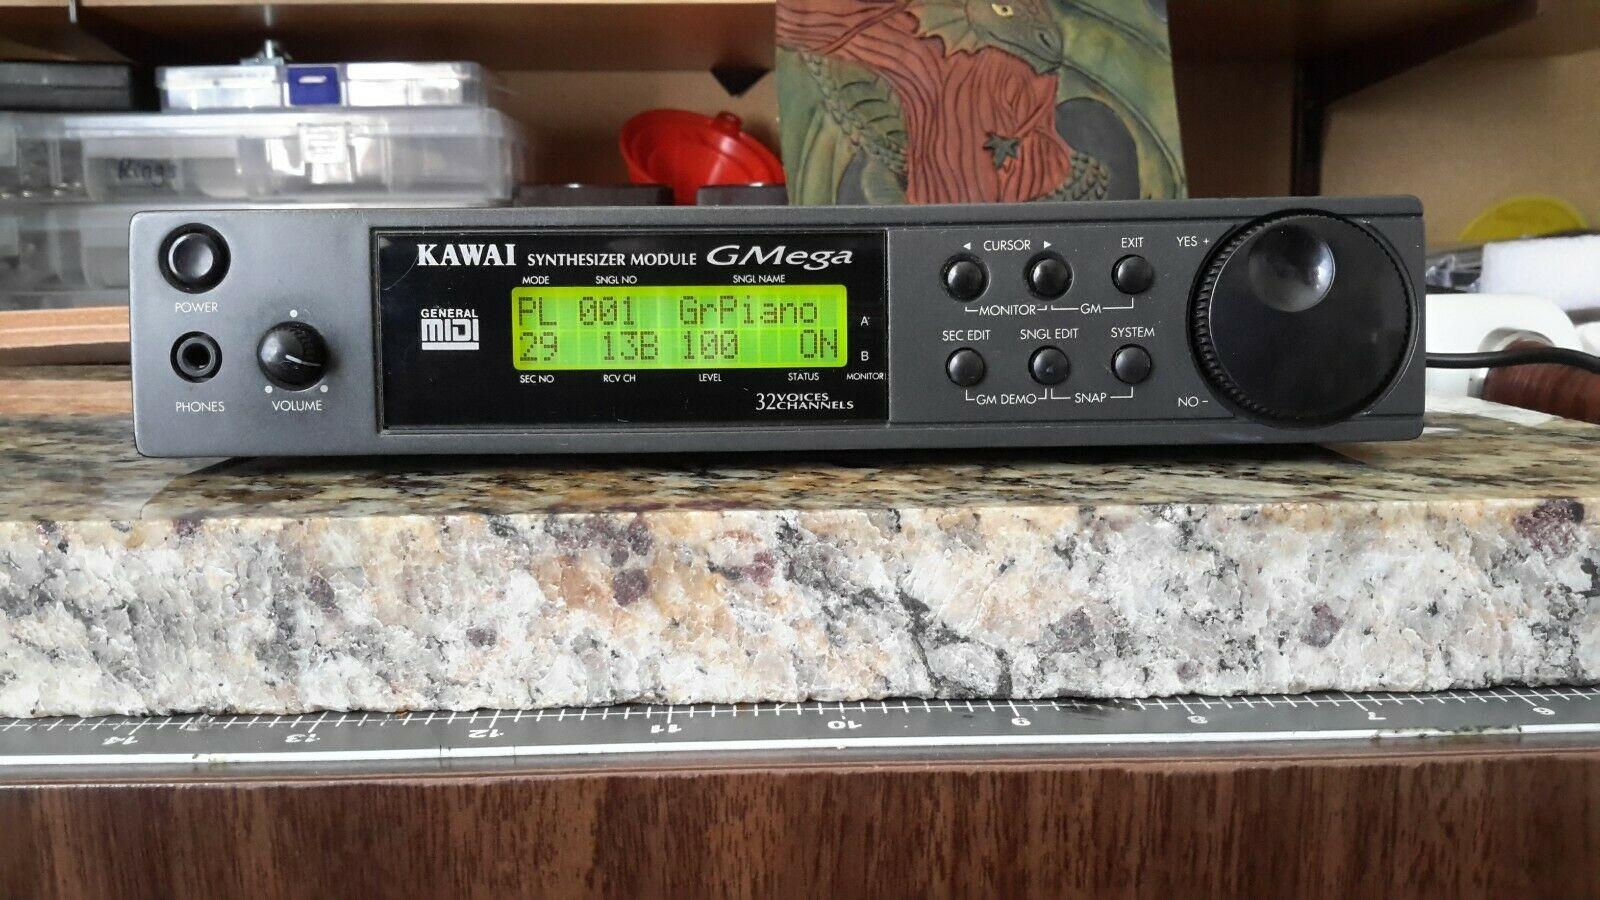 MATRIXSYNTH: Kawai GMega Genaral Midi Synthesizer Module SN